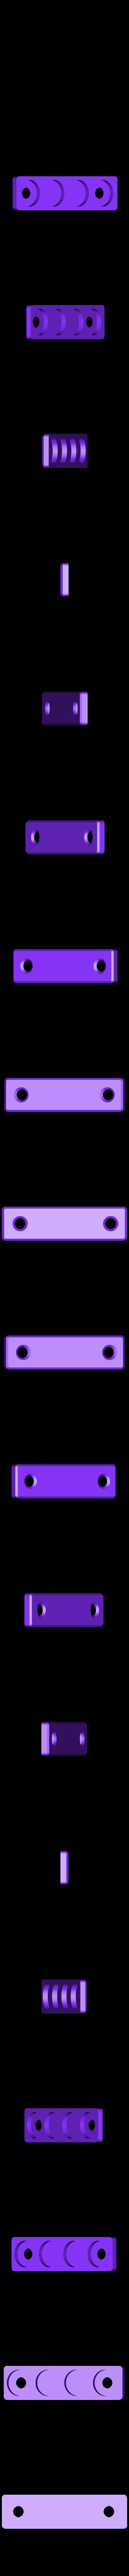 Magnetic_Tool_Holder_.STL Download free STL file Magnetic Tool Holder • 3D printing template, listart